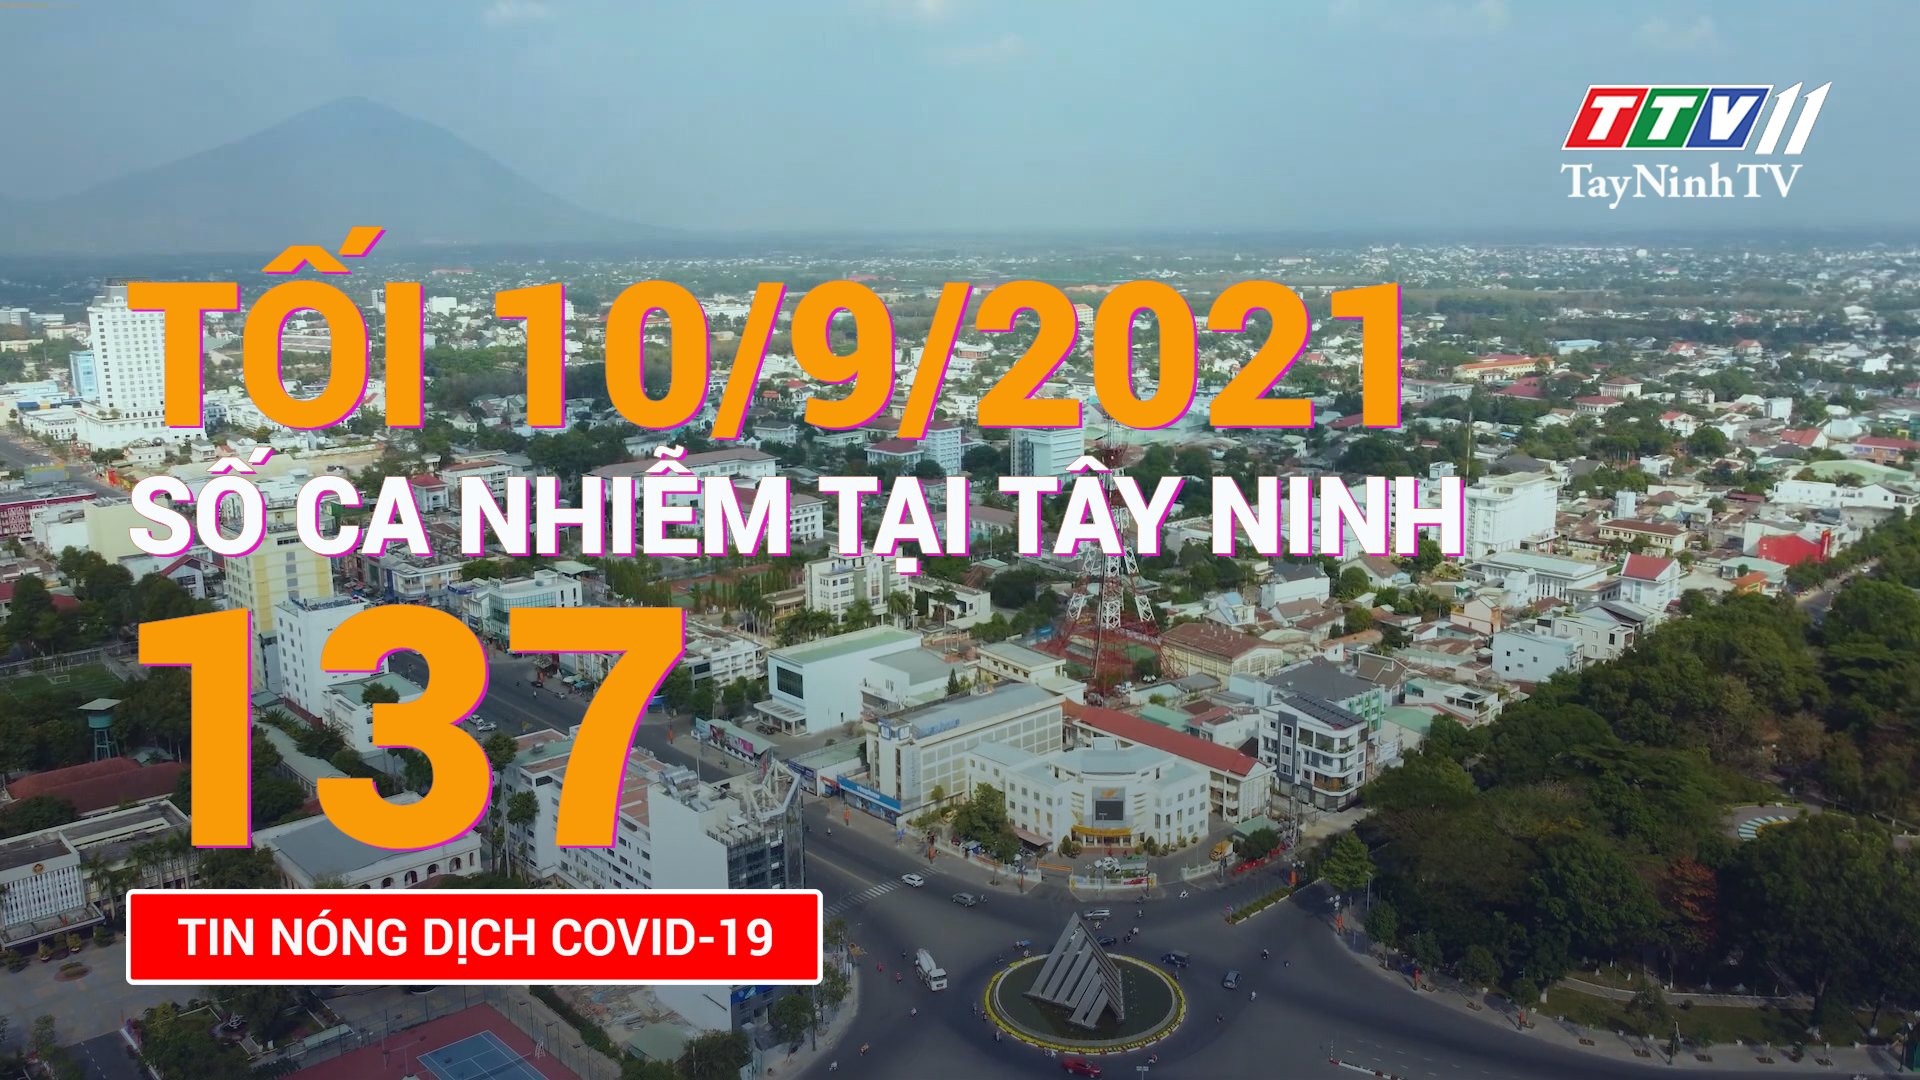 Tin tức Covid-19 tối 10/9/2021 | TayNinhTV